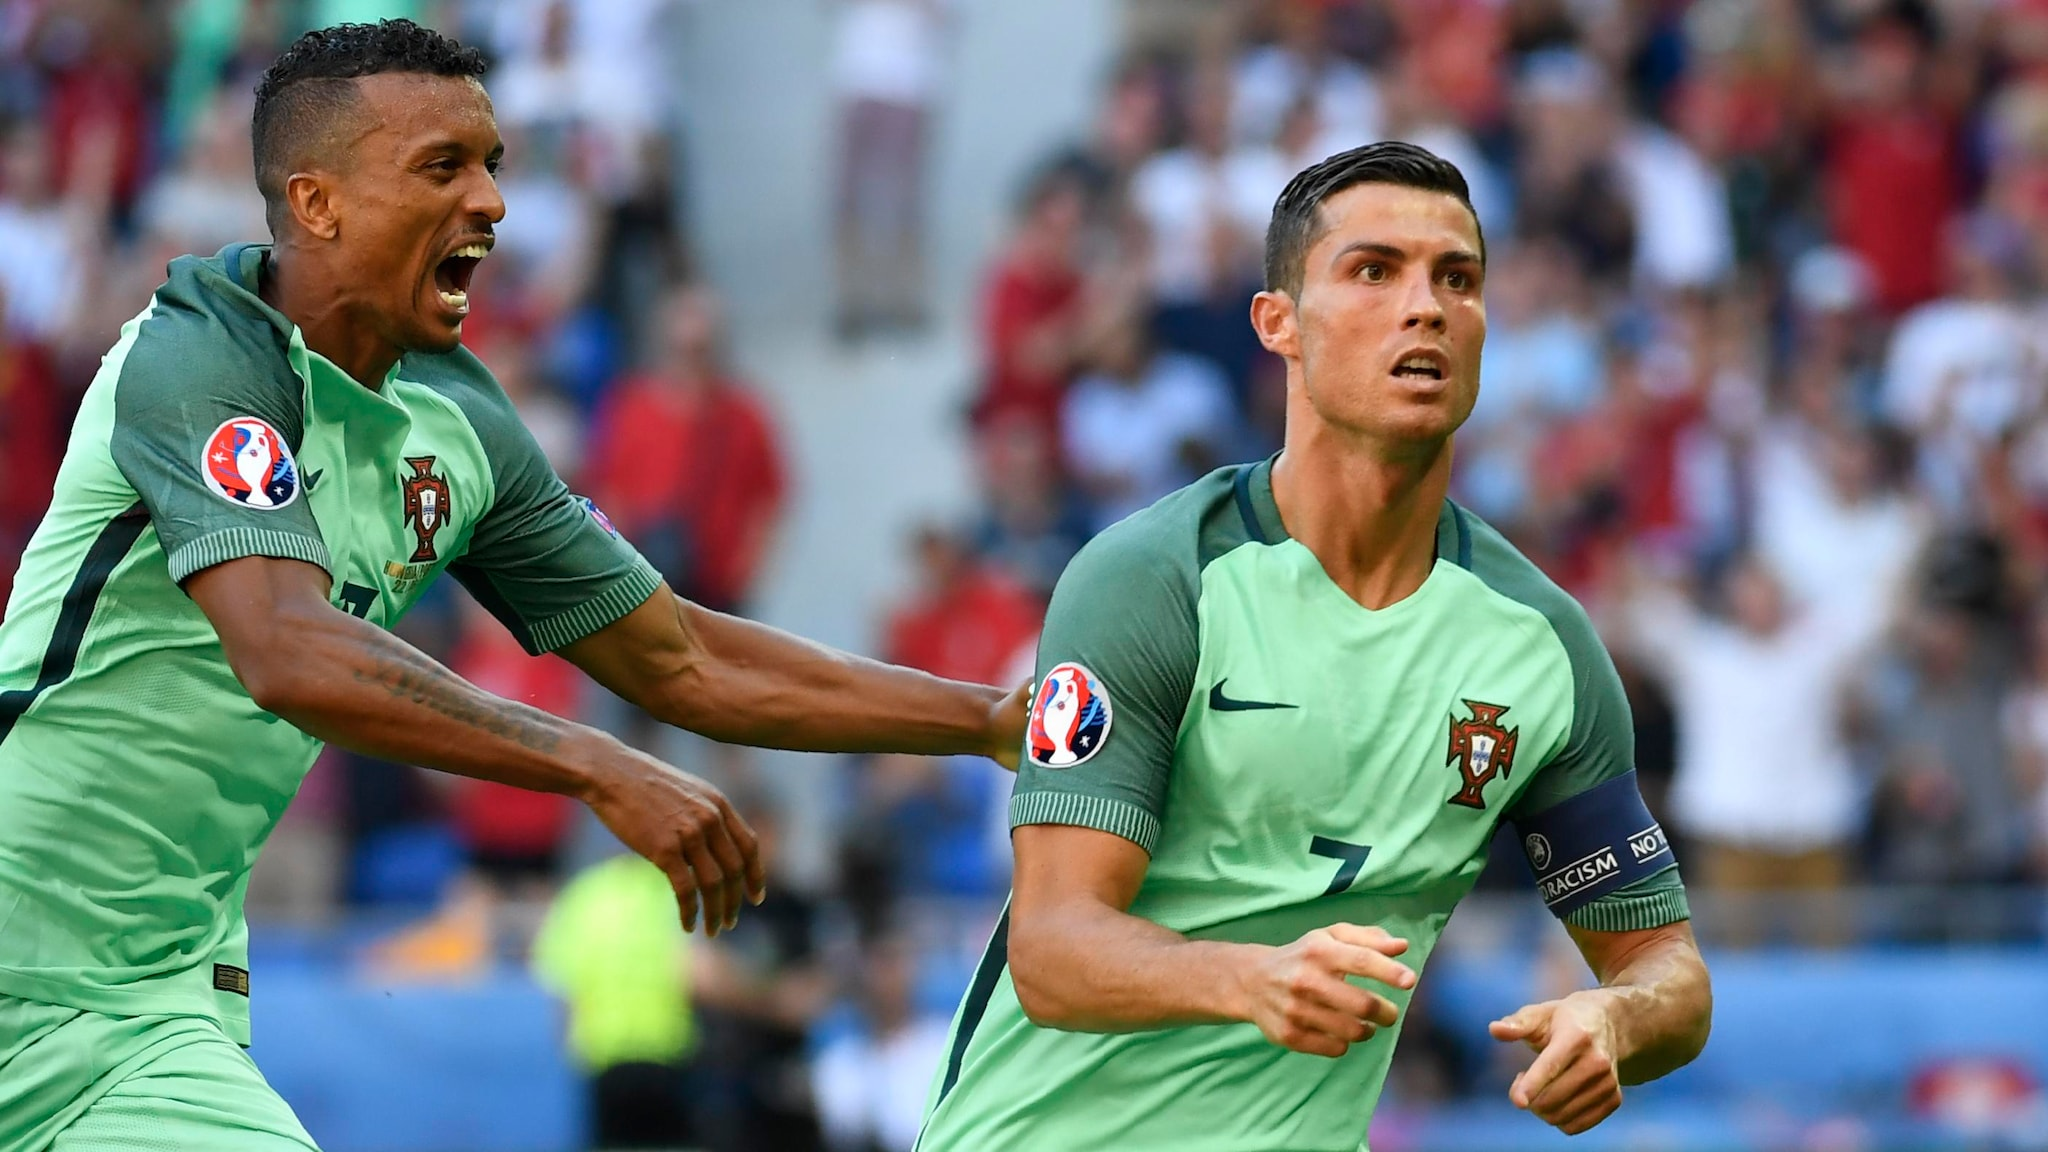 Hungary Portugal Hungary Vs Portugal Uefa Euro 2020 Match Background Facts And Stats Uefa Euro 2020 Uefa Com